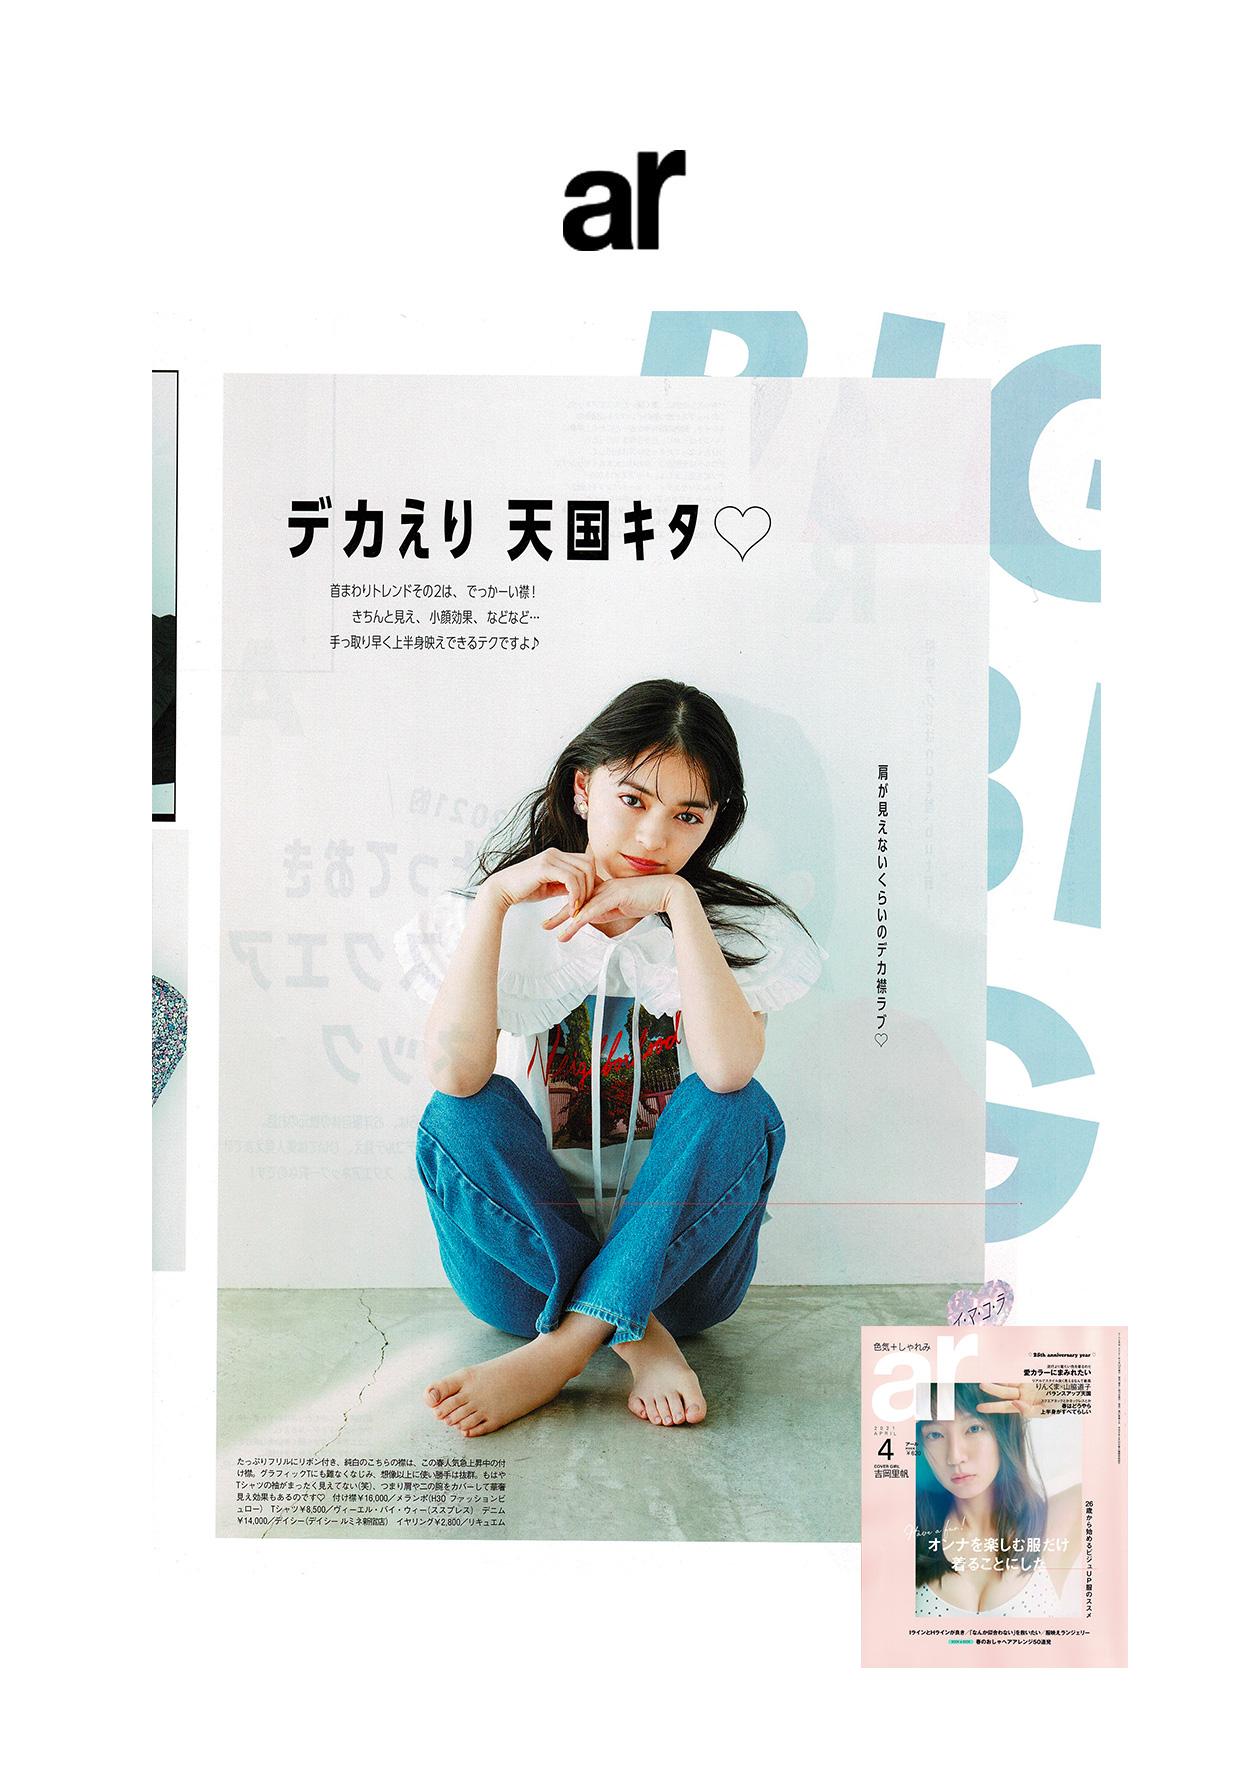 melampo press on sweet magazine5